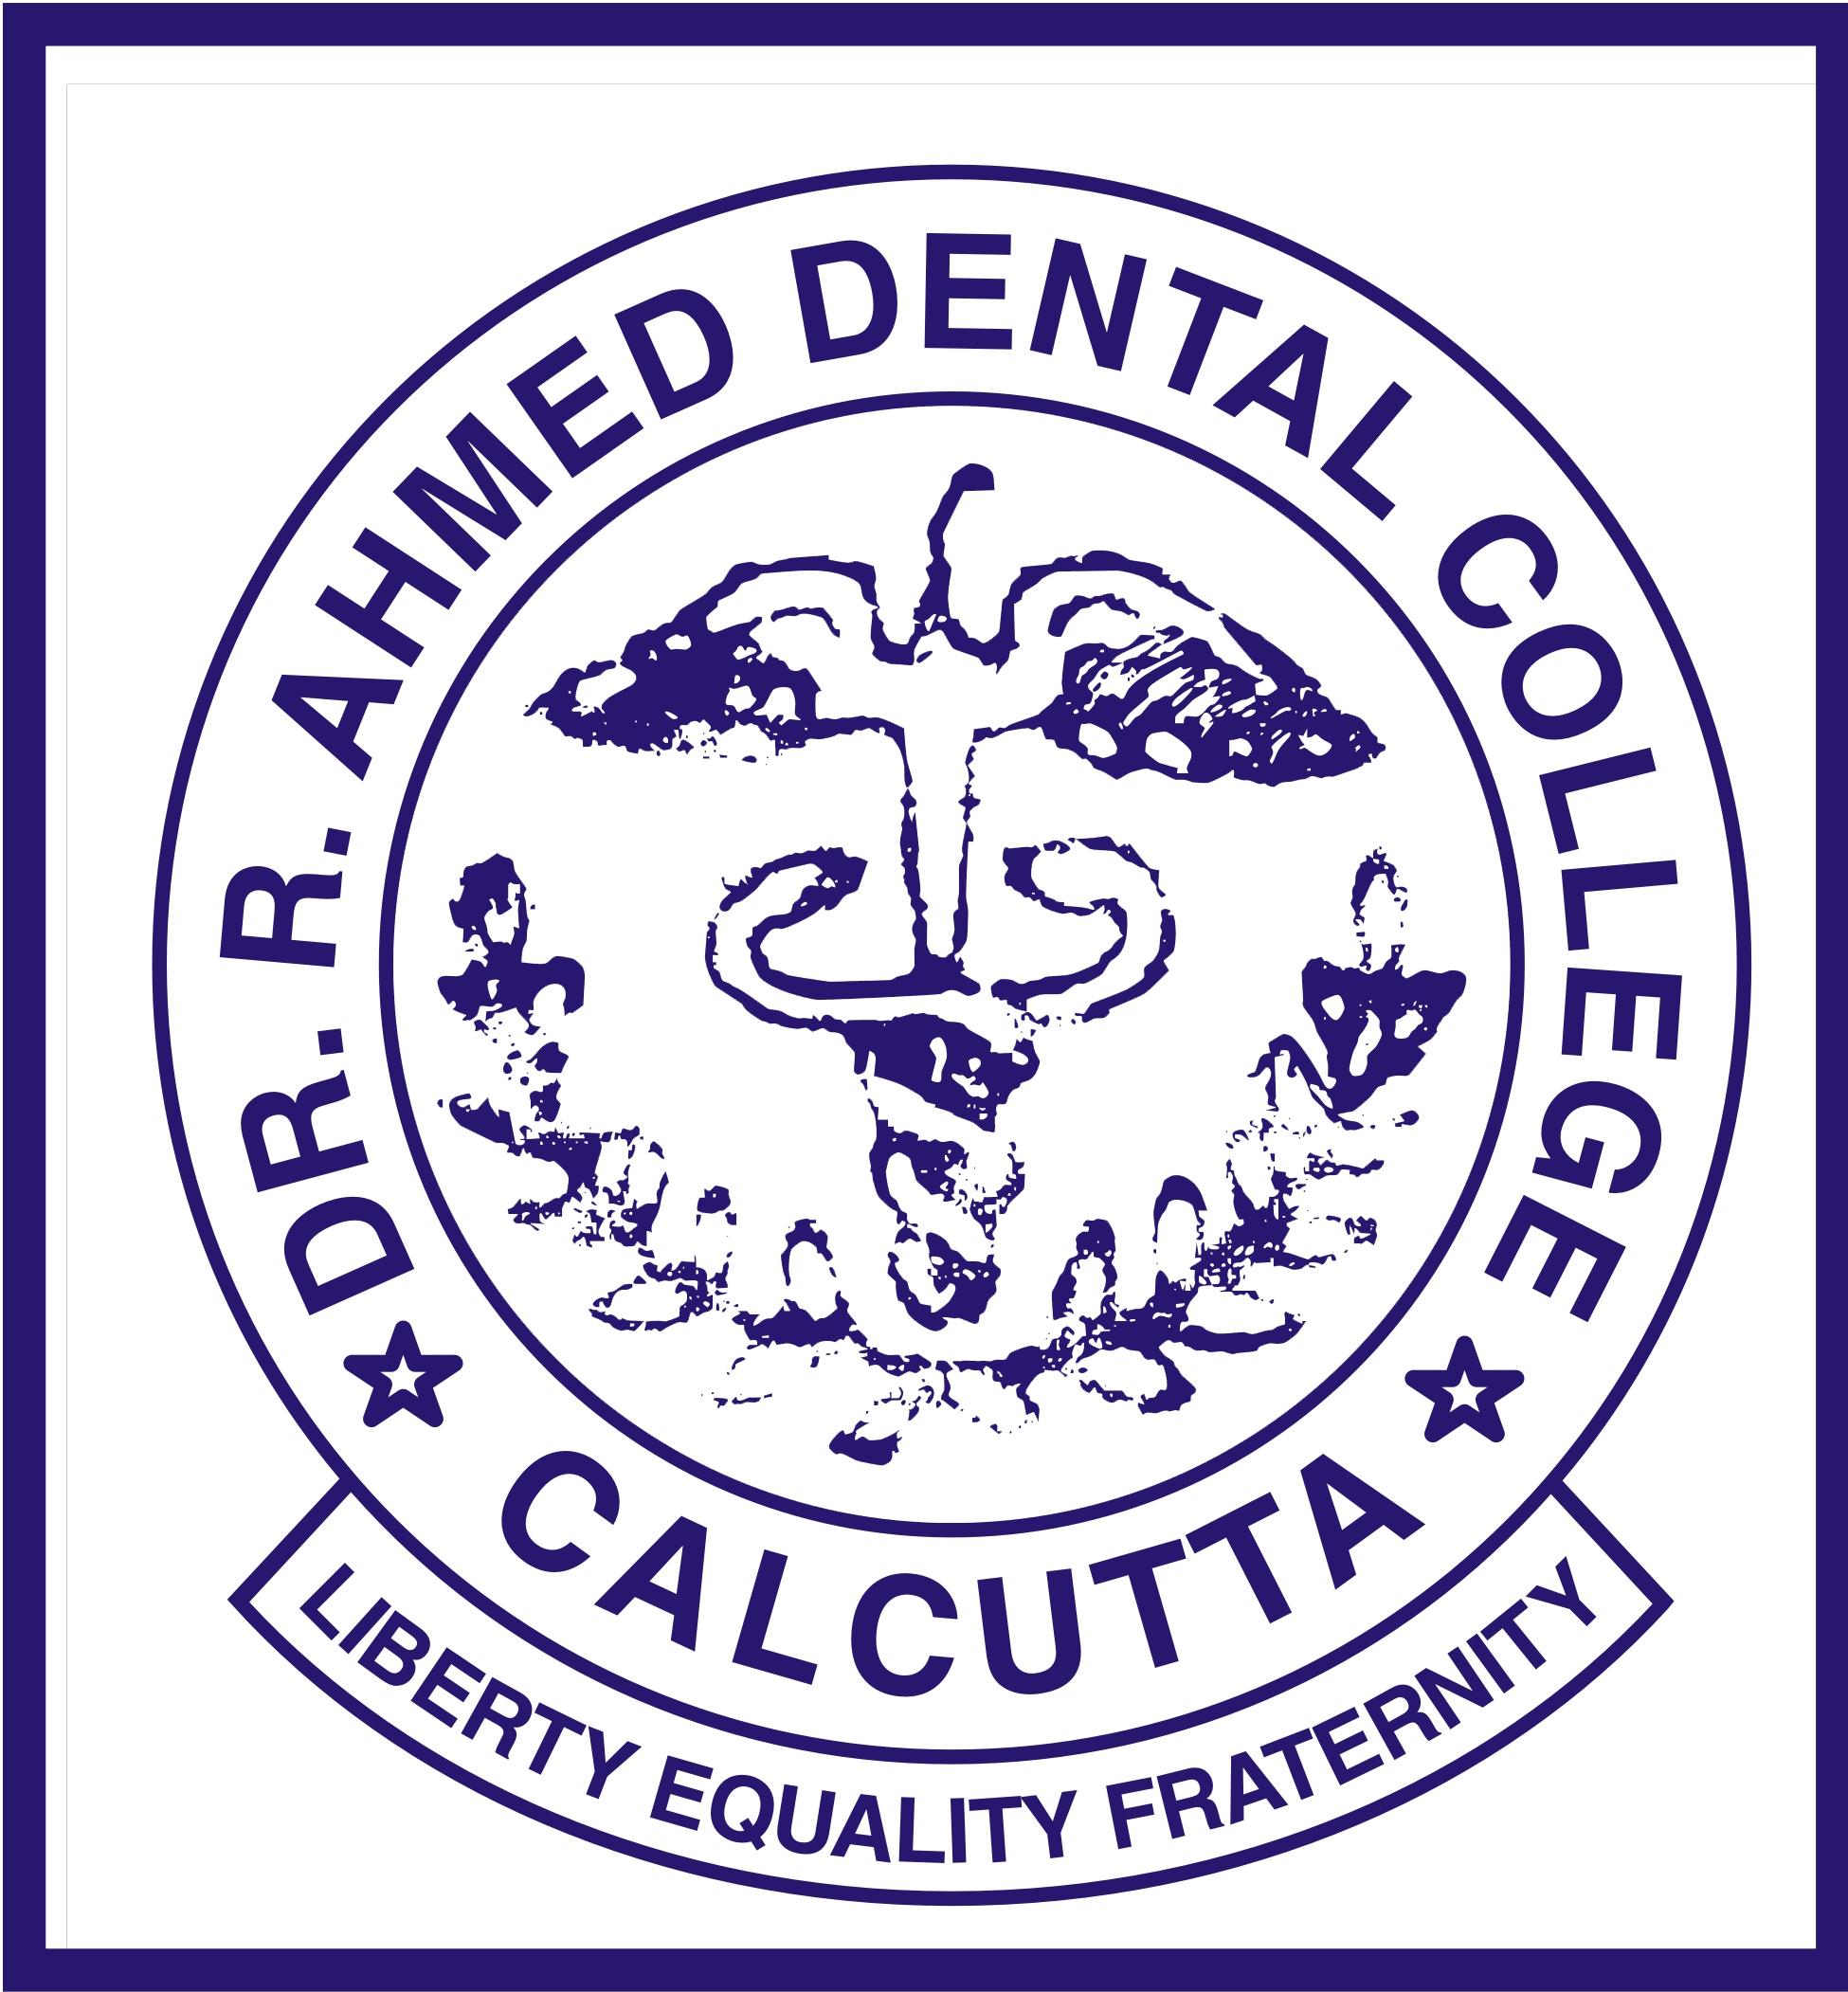 Dr. R. Ahmed Dental College and Hospital, Kolkata